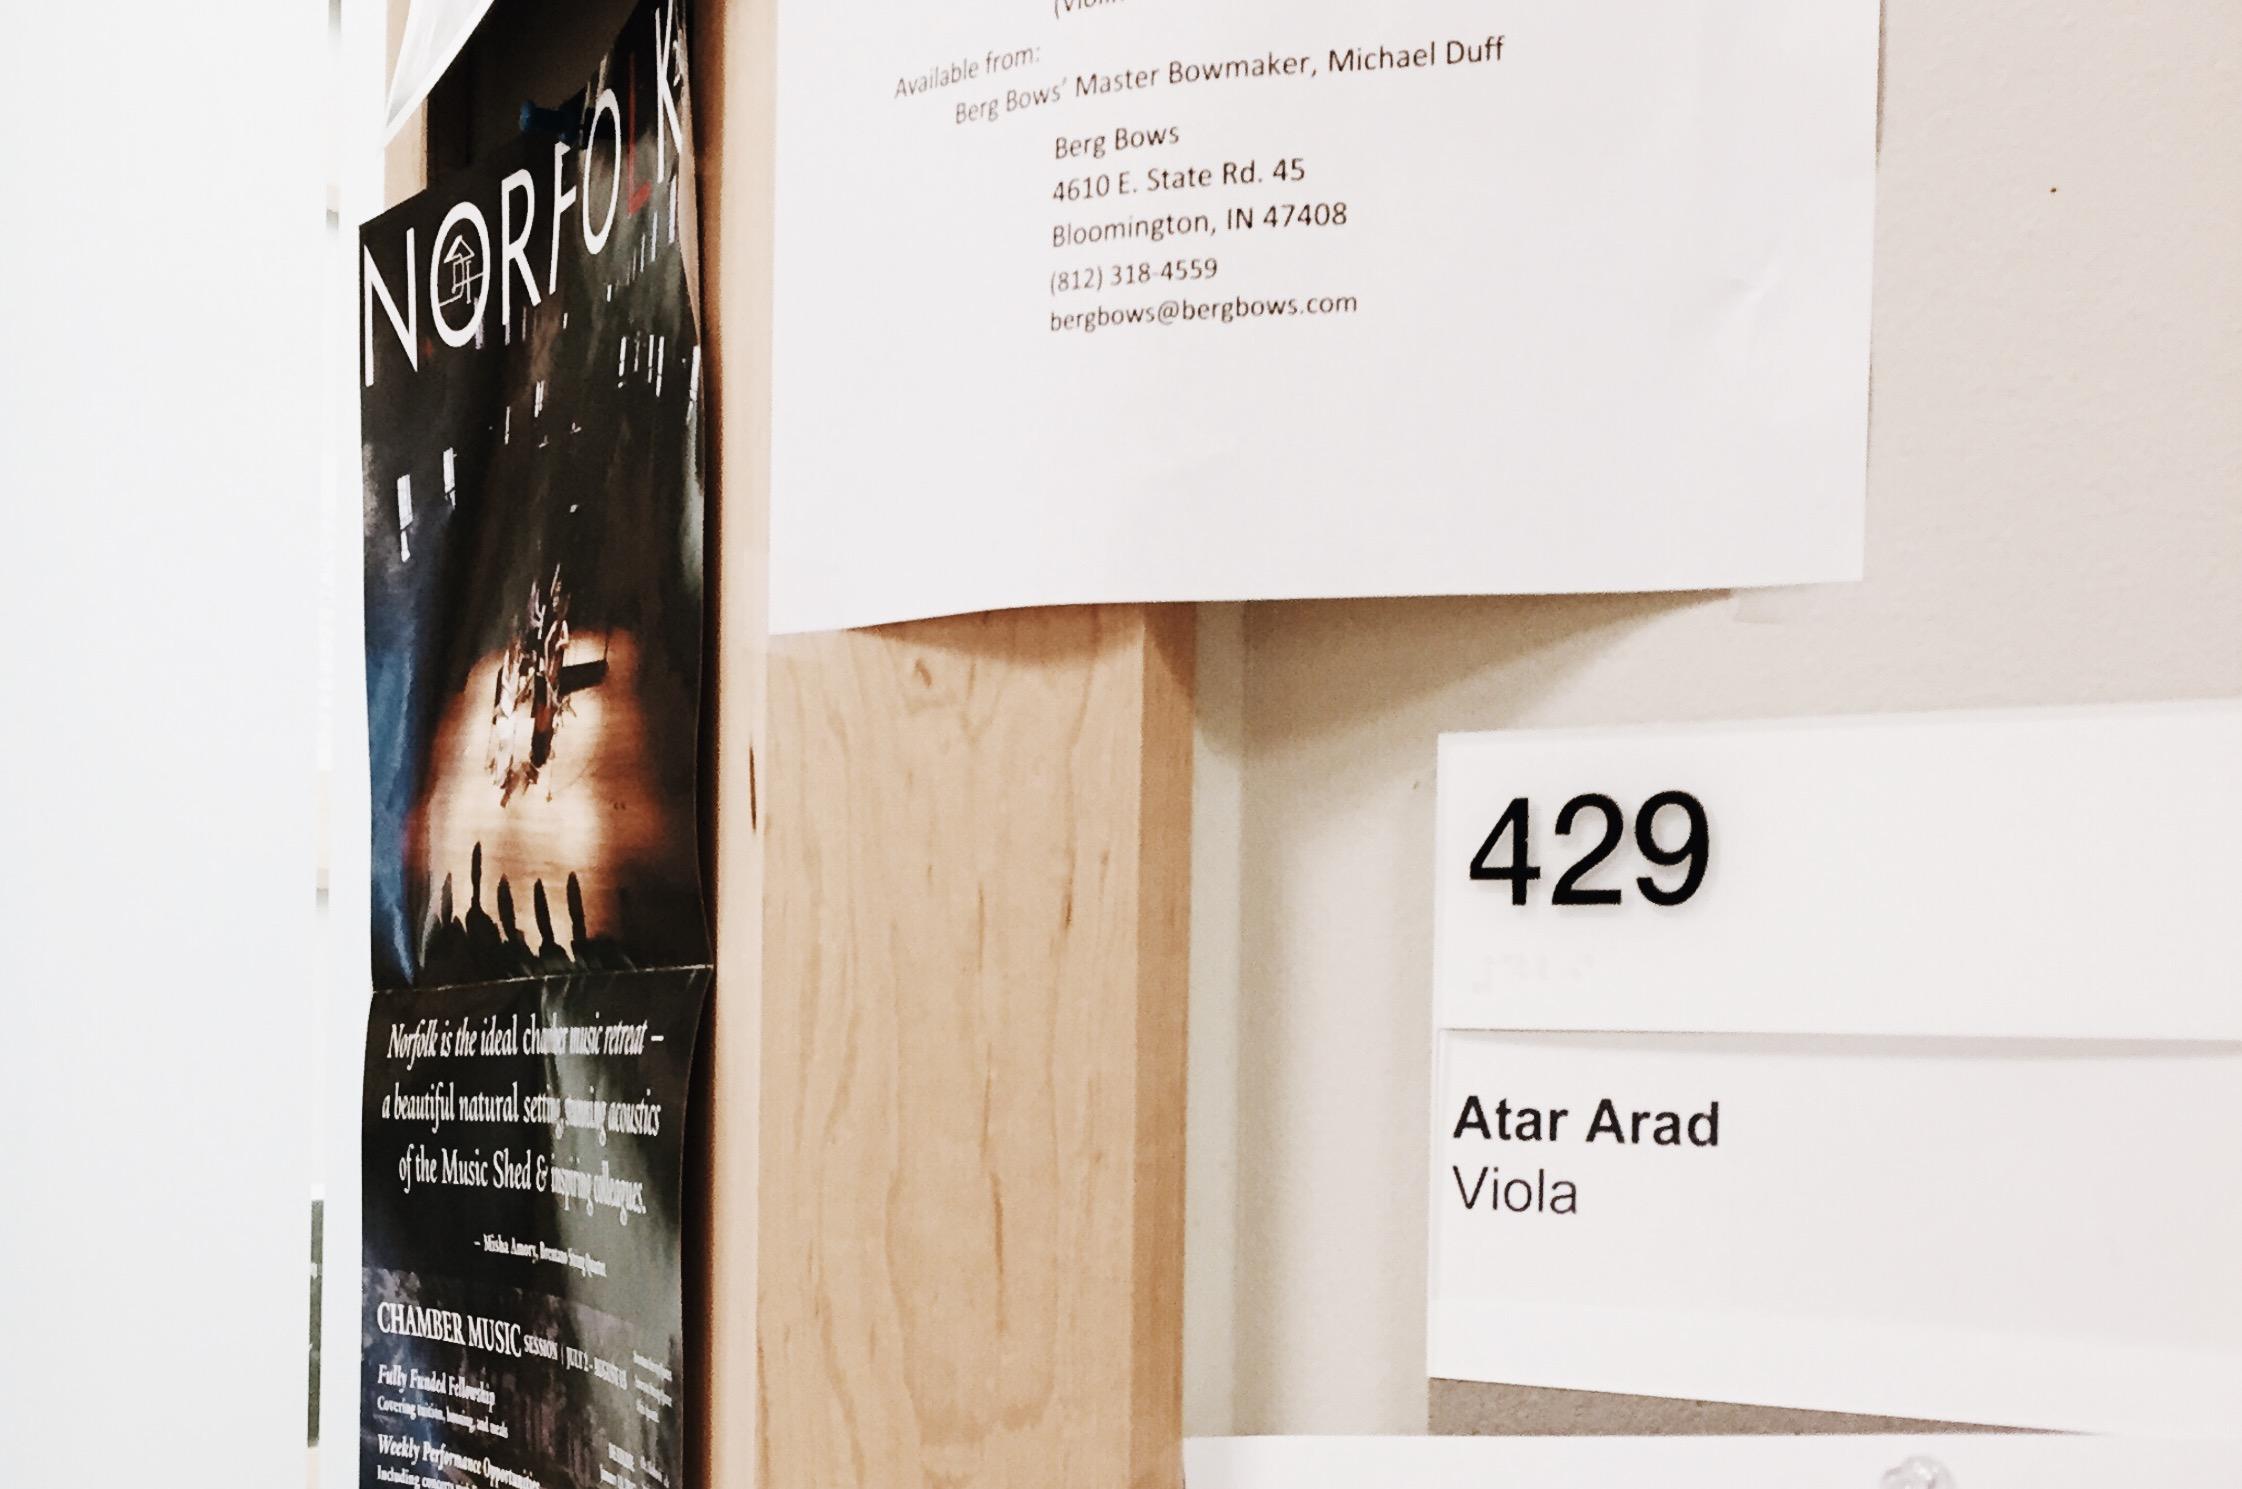 prof. Arad's studio at Indiana University